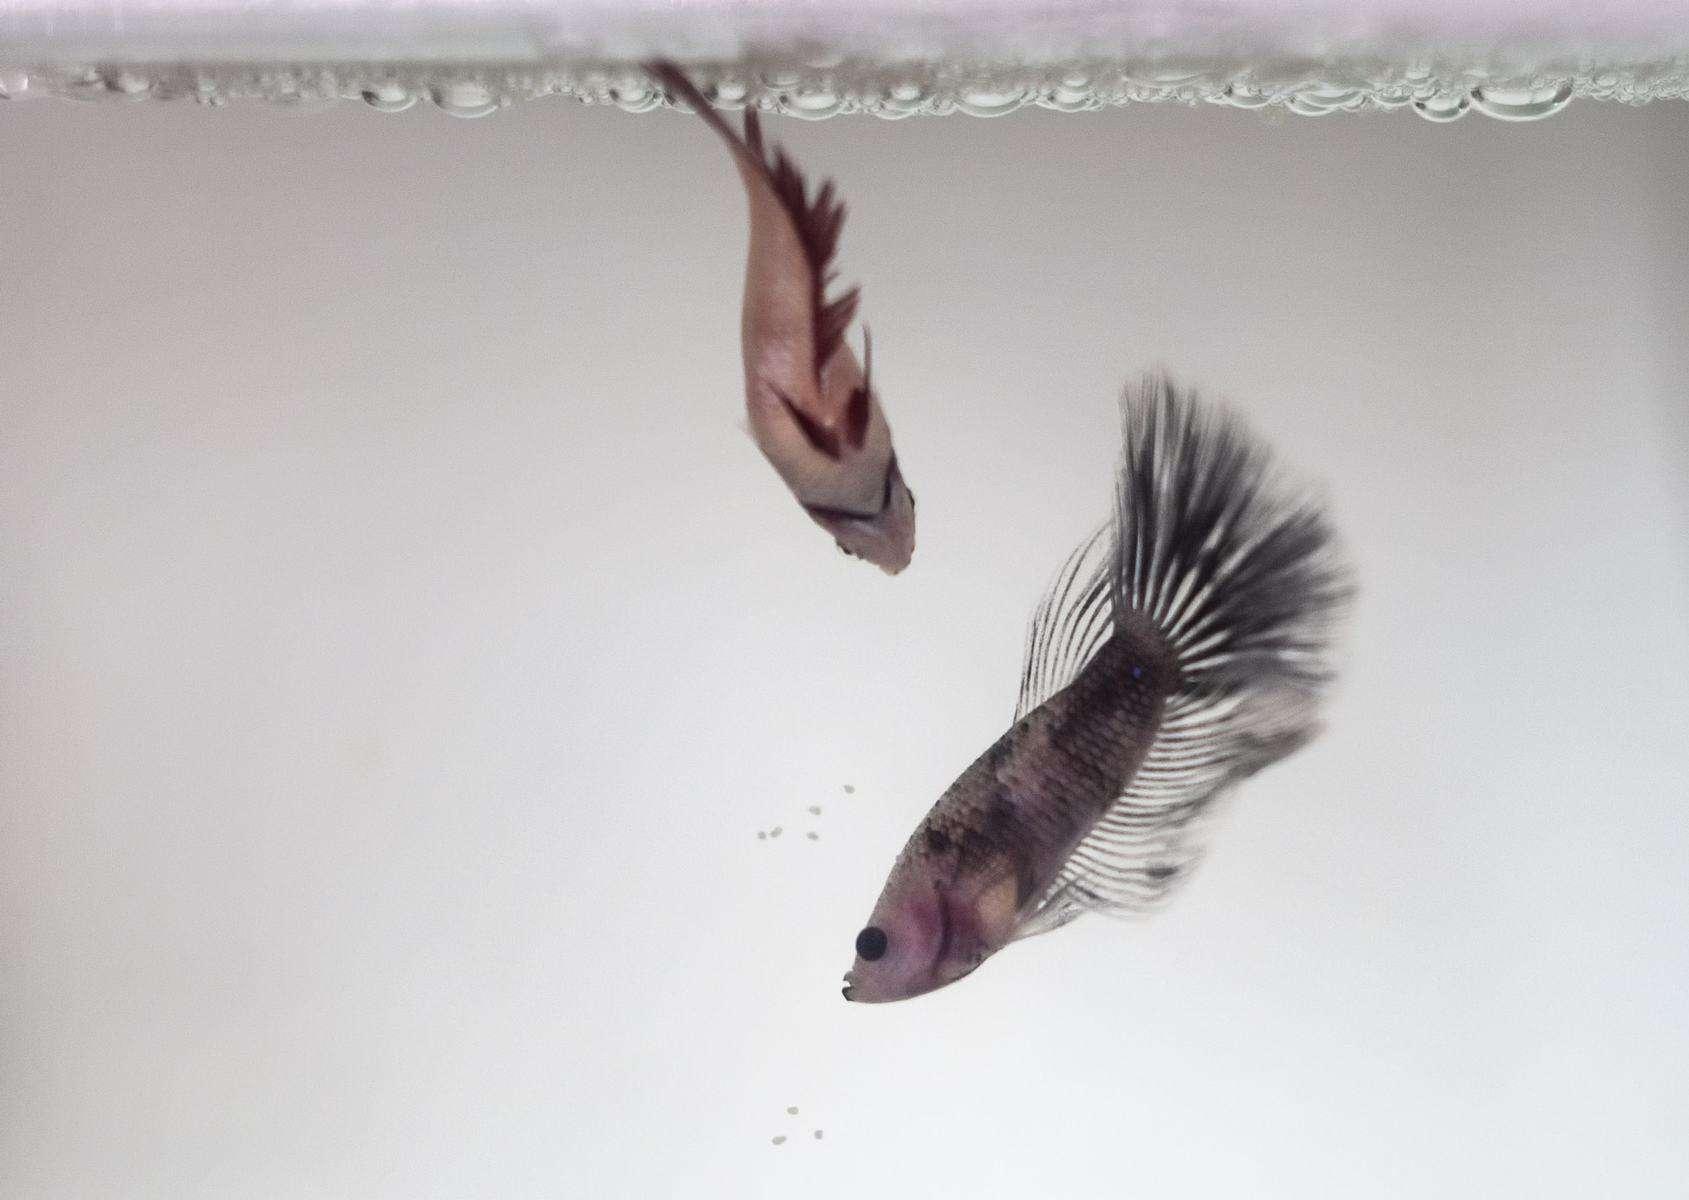 betta fish dancing